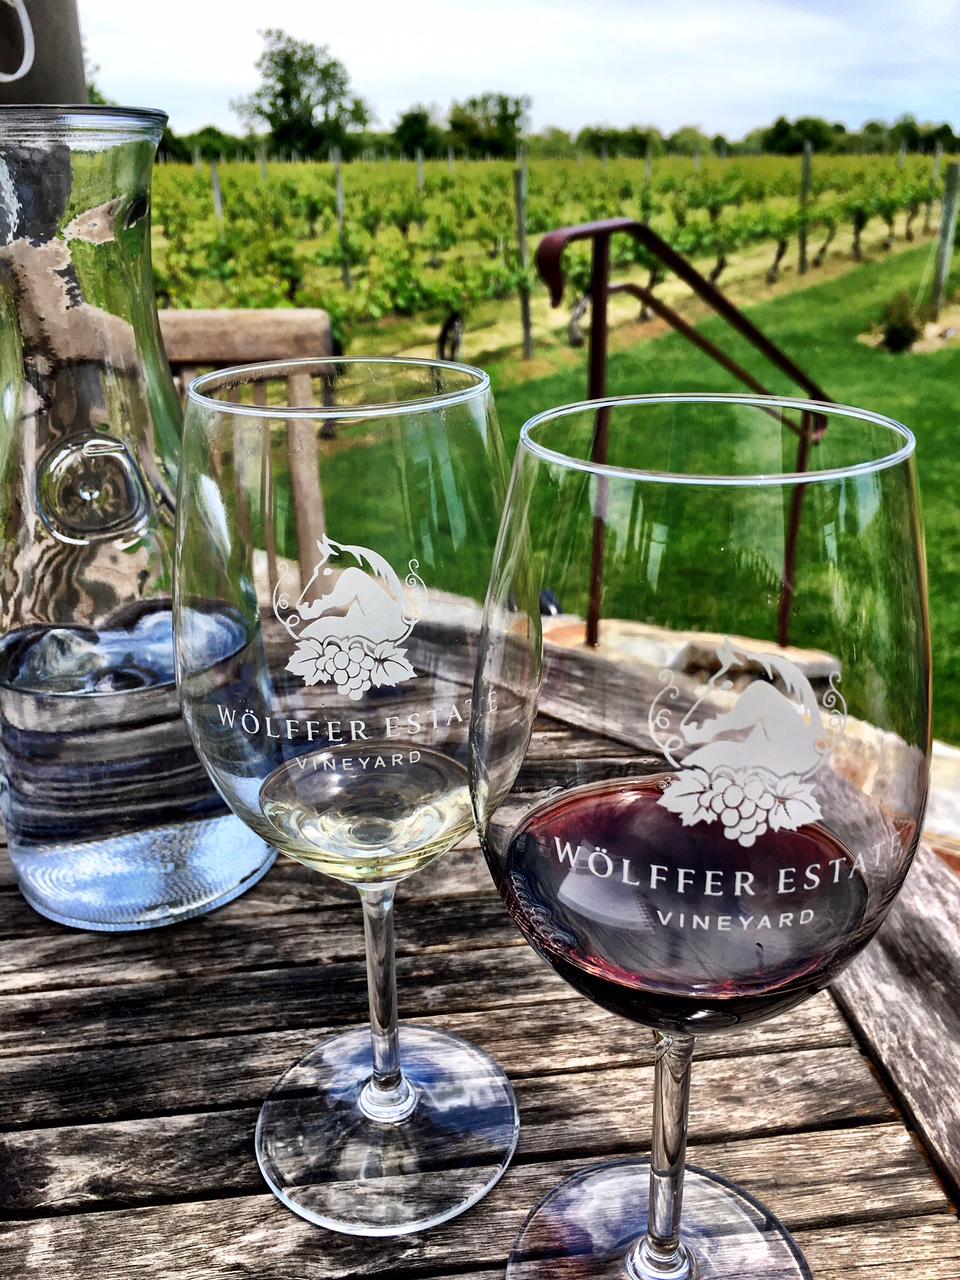 taste_of_purple_visits_wolffer_estate_wine.png